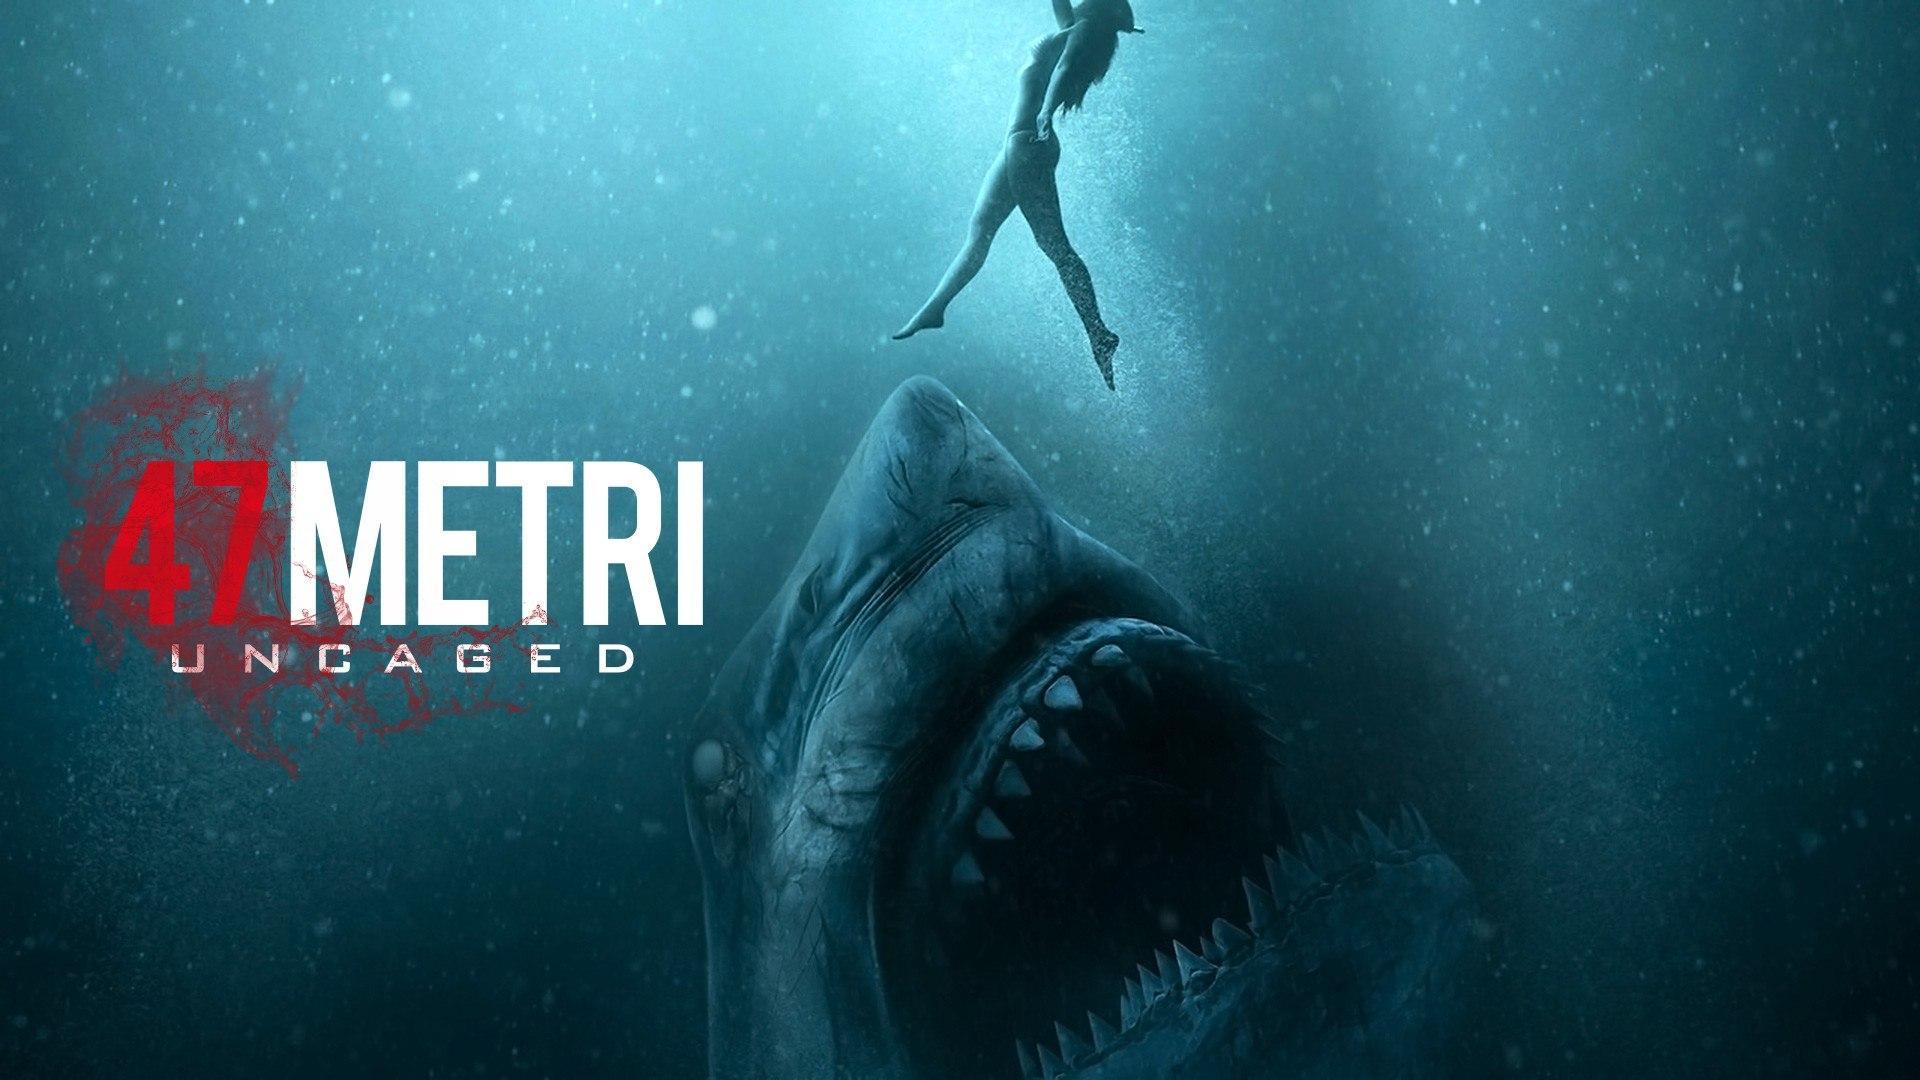 Sabato 5 Settembre 2020 Sky Cinema HD, 47 Metri: Uncaged